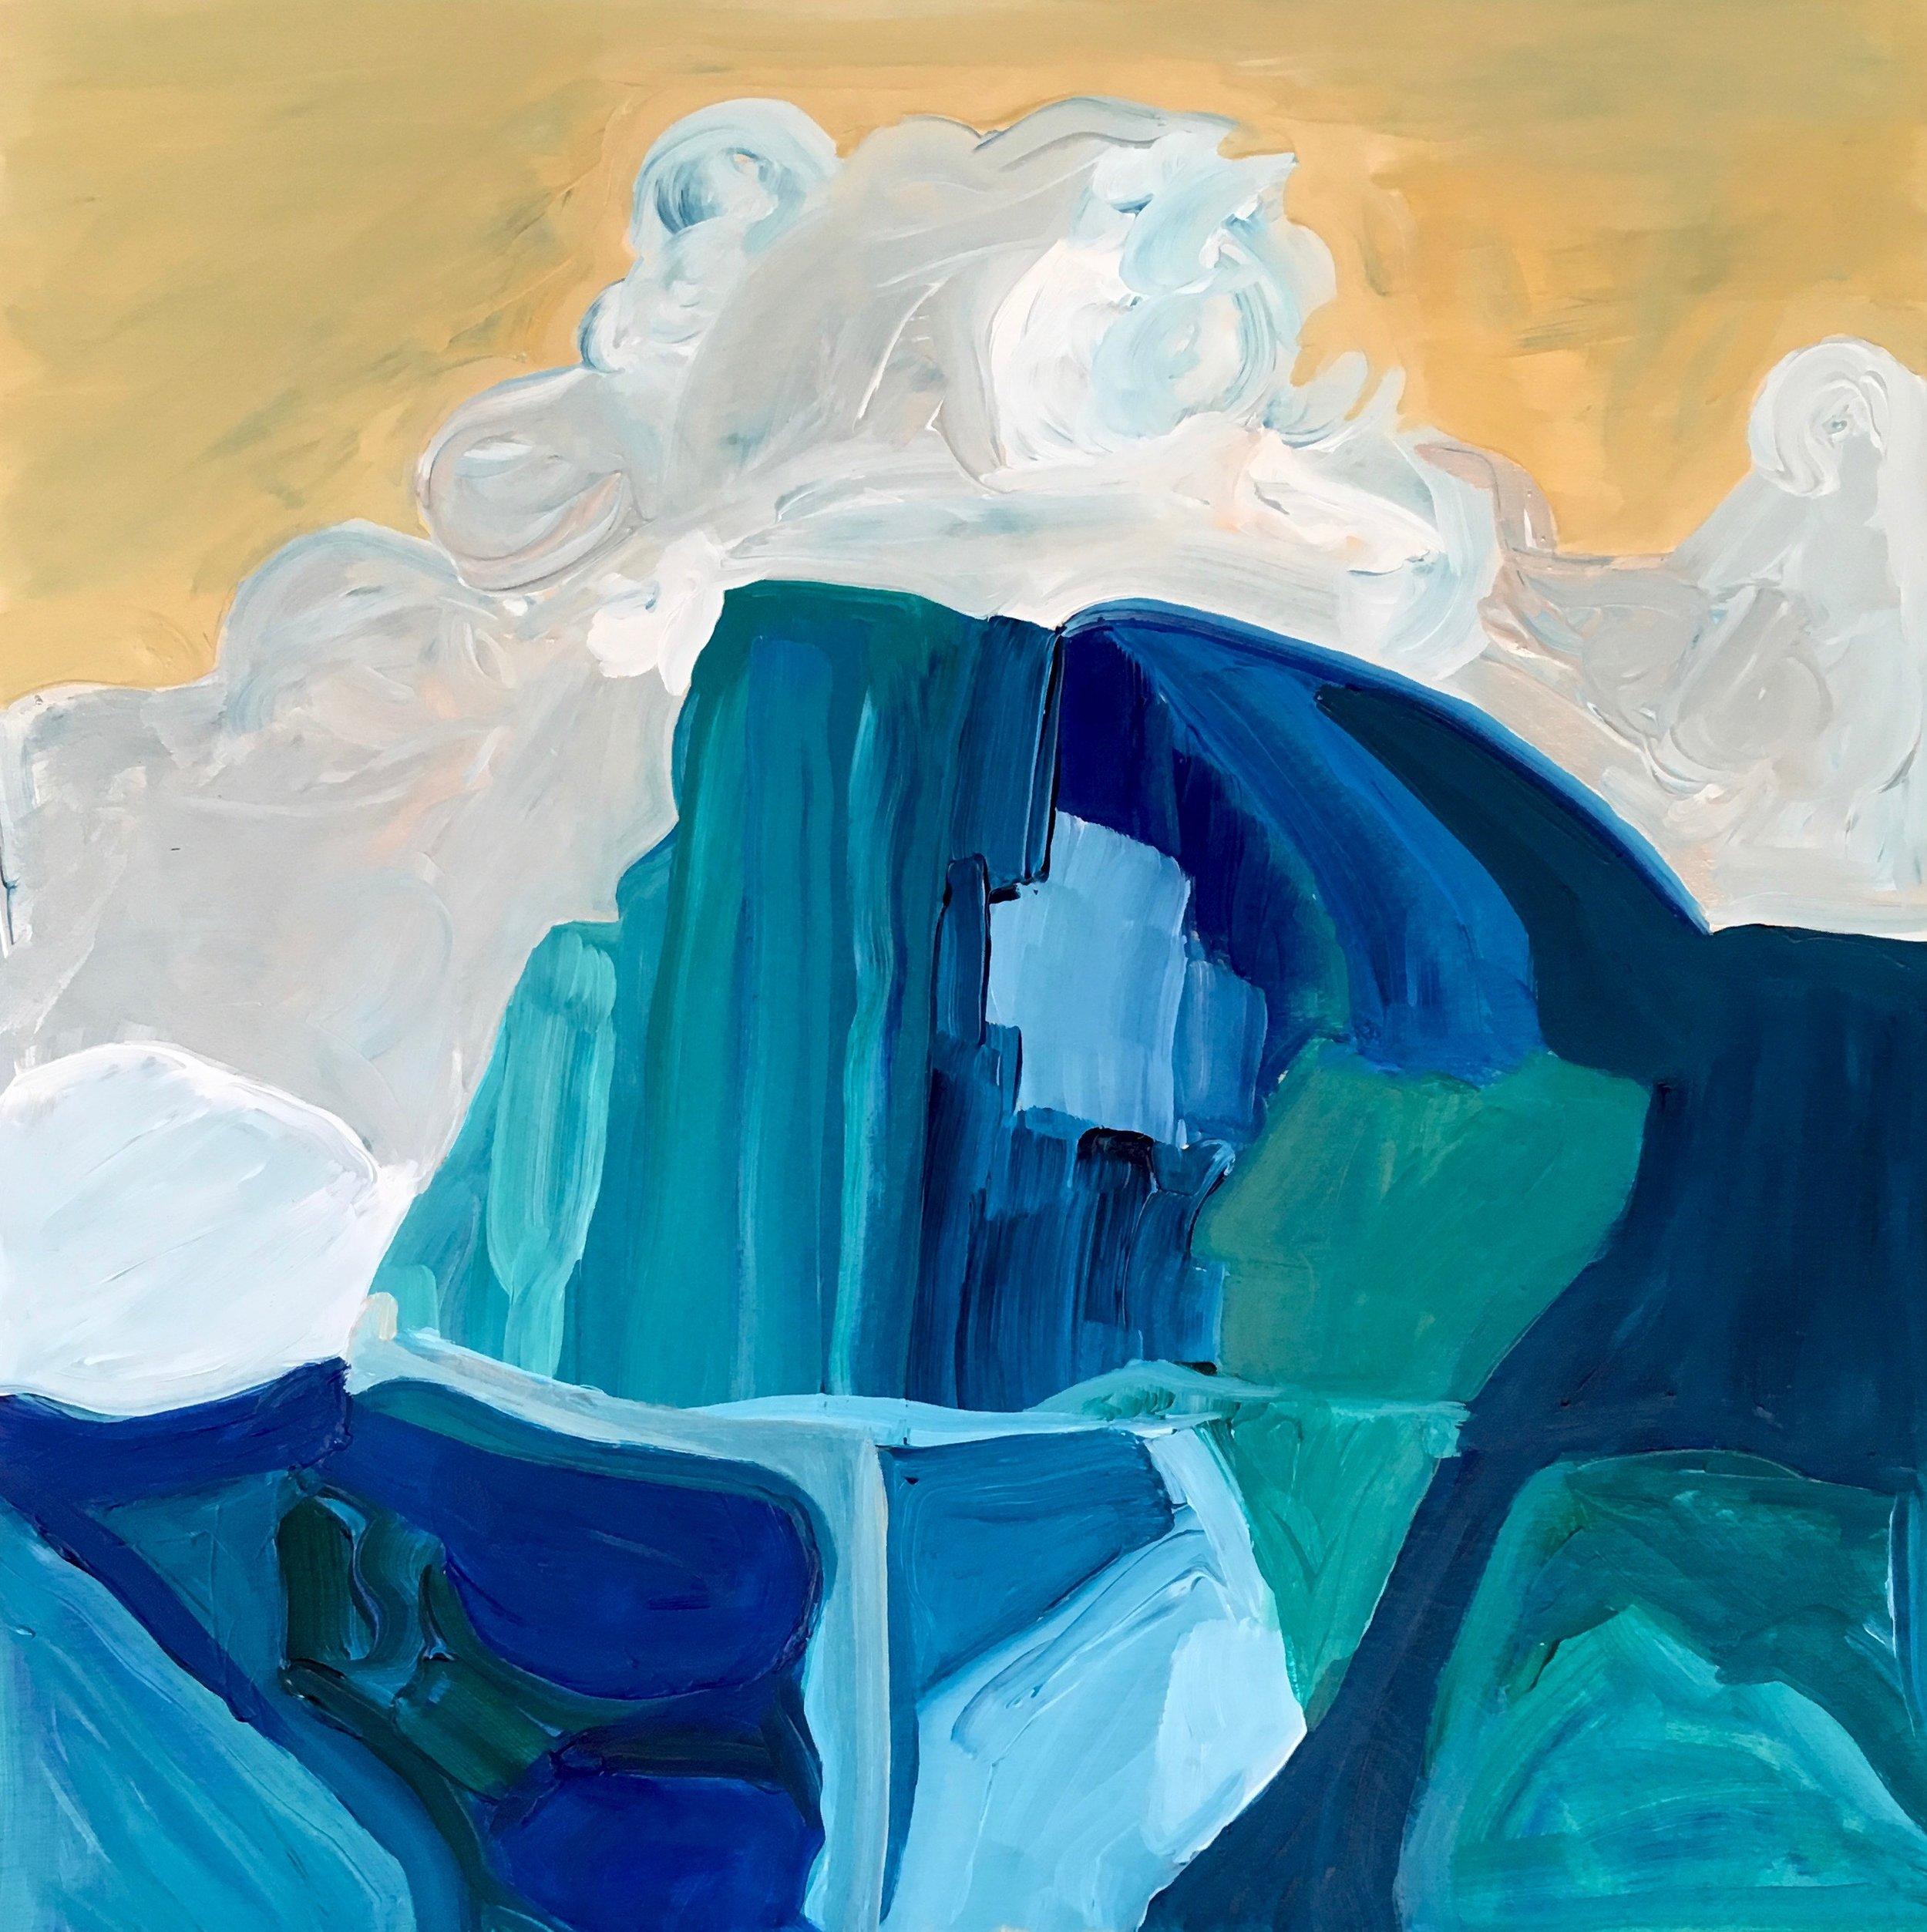 Rendering of Ansel Adams: Half Dome, Thunder Cloud, Yosemite Valley